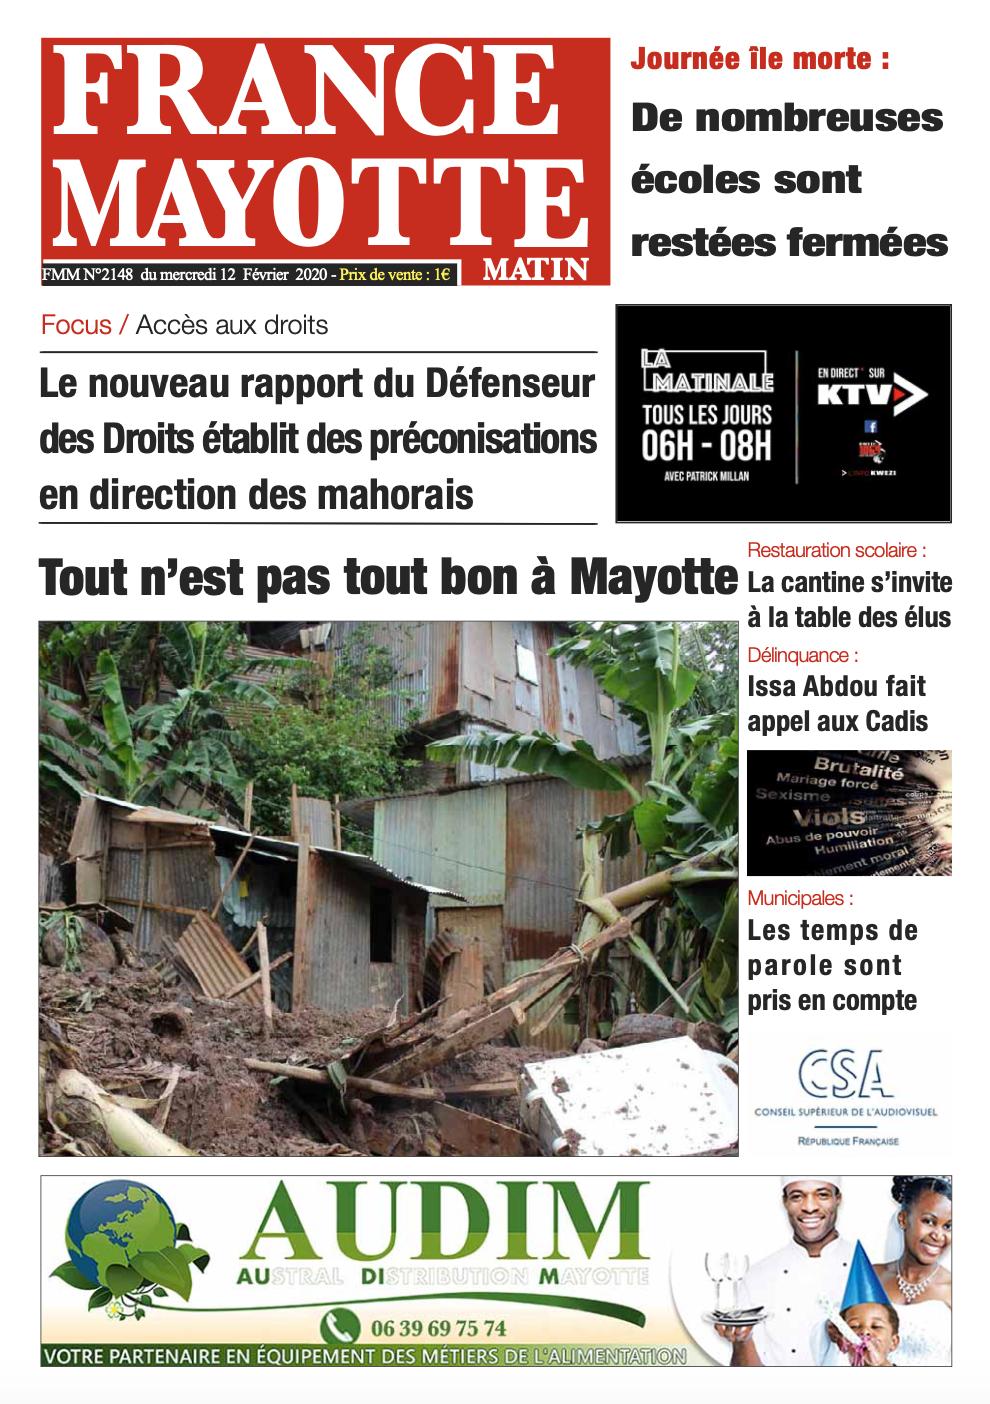 France Mayotte Mercredi 12 février 2020